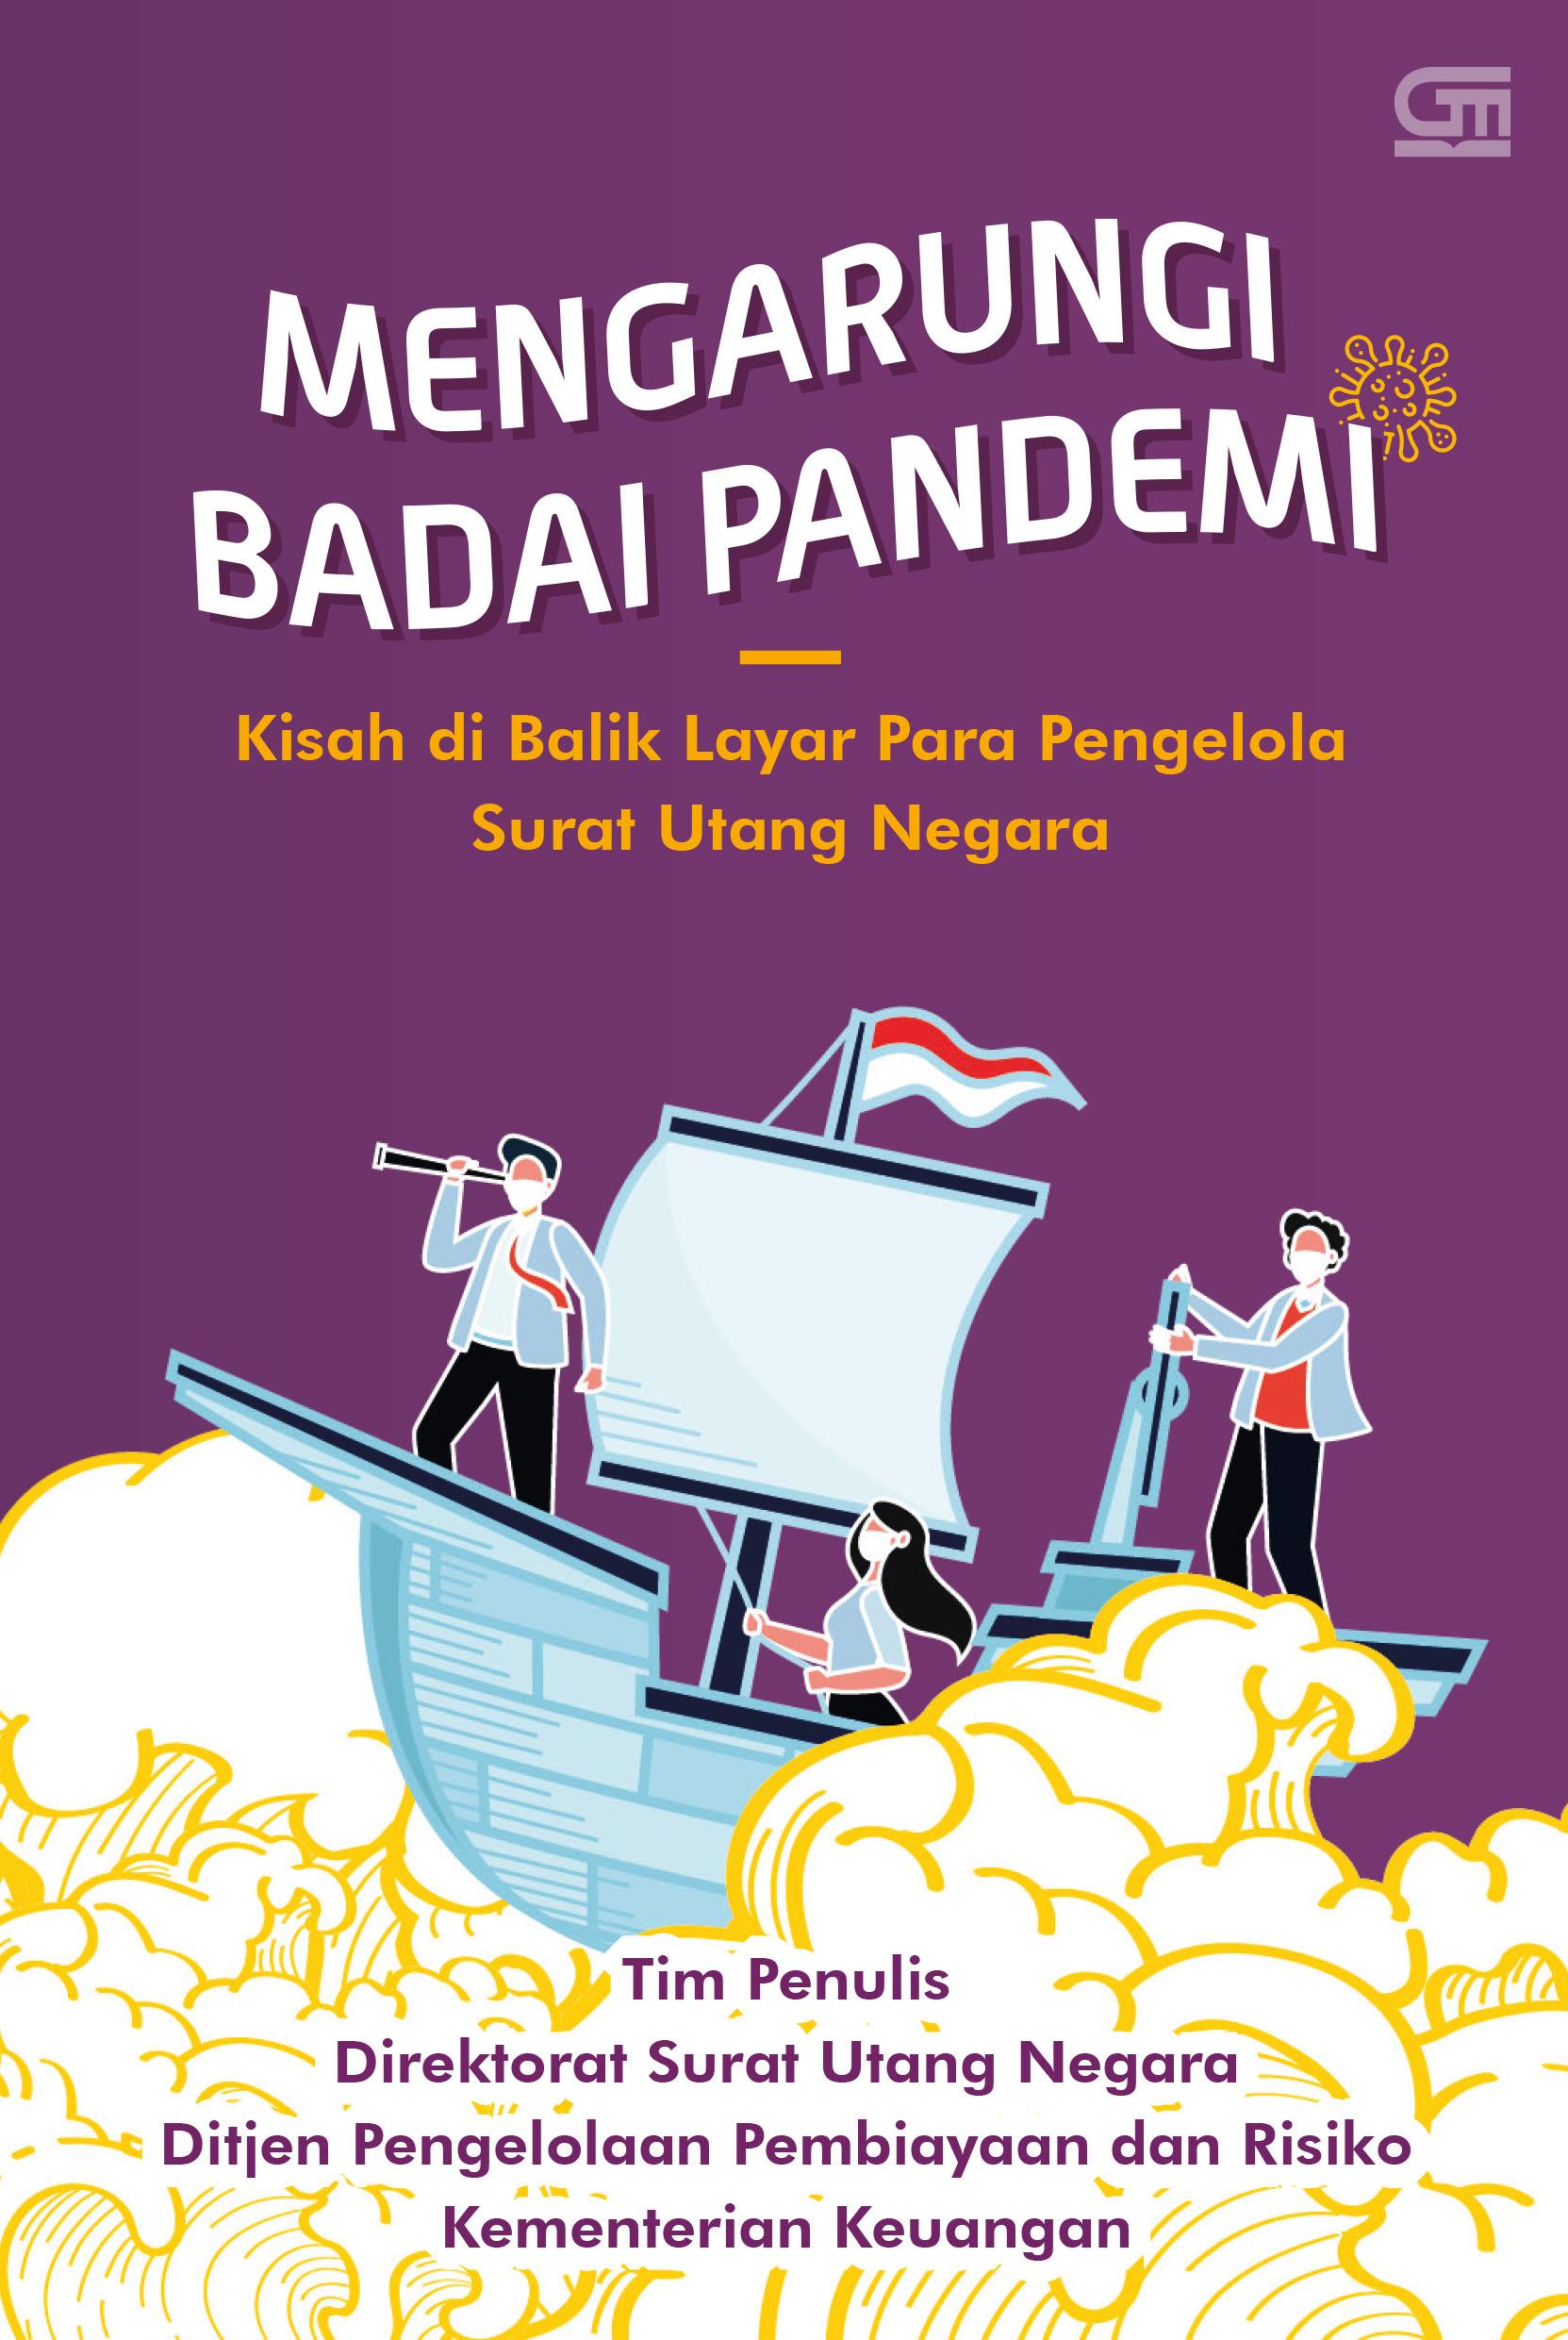 Mengarungi Badai Pandemi